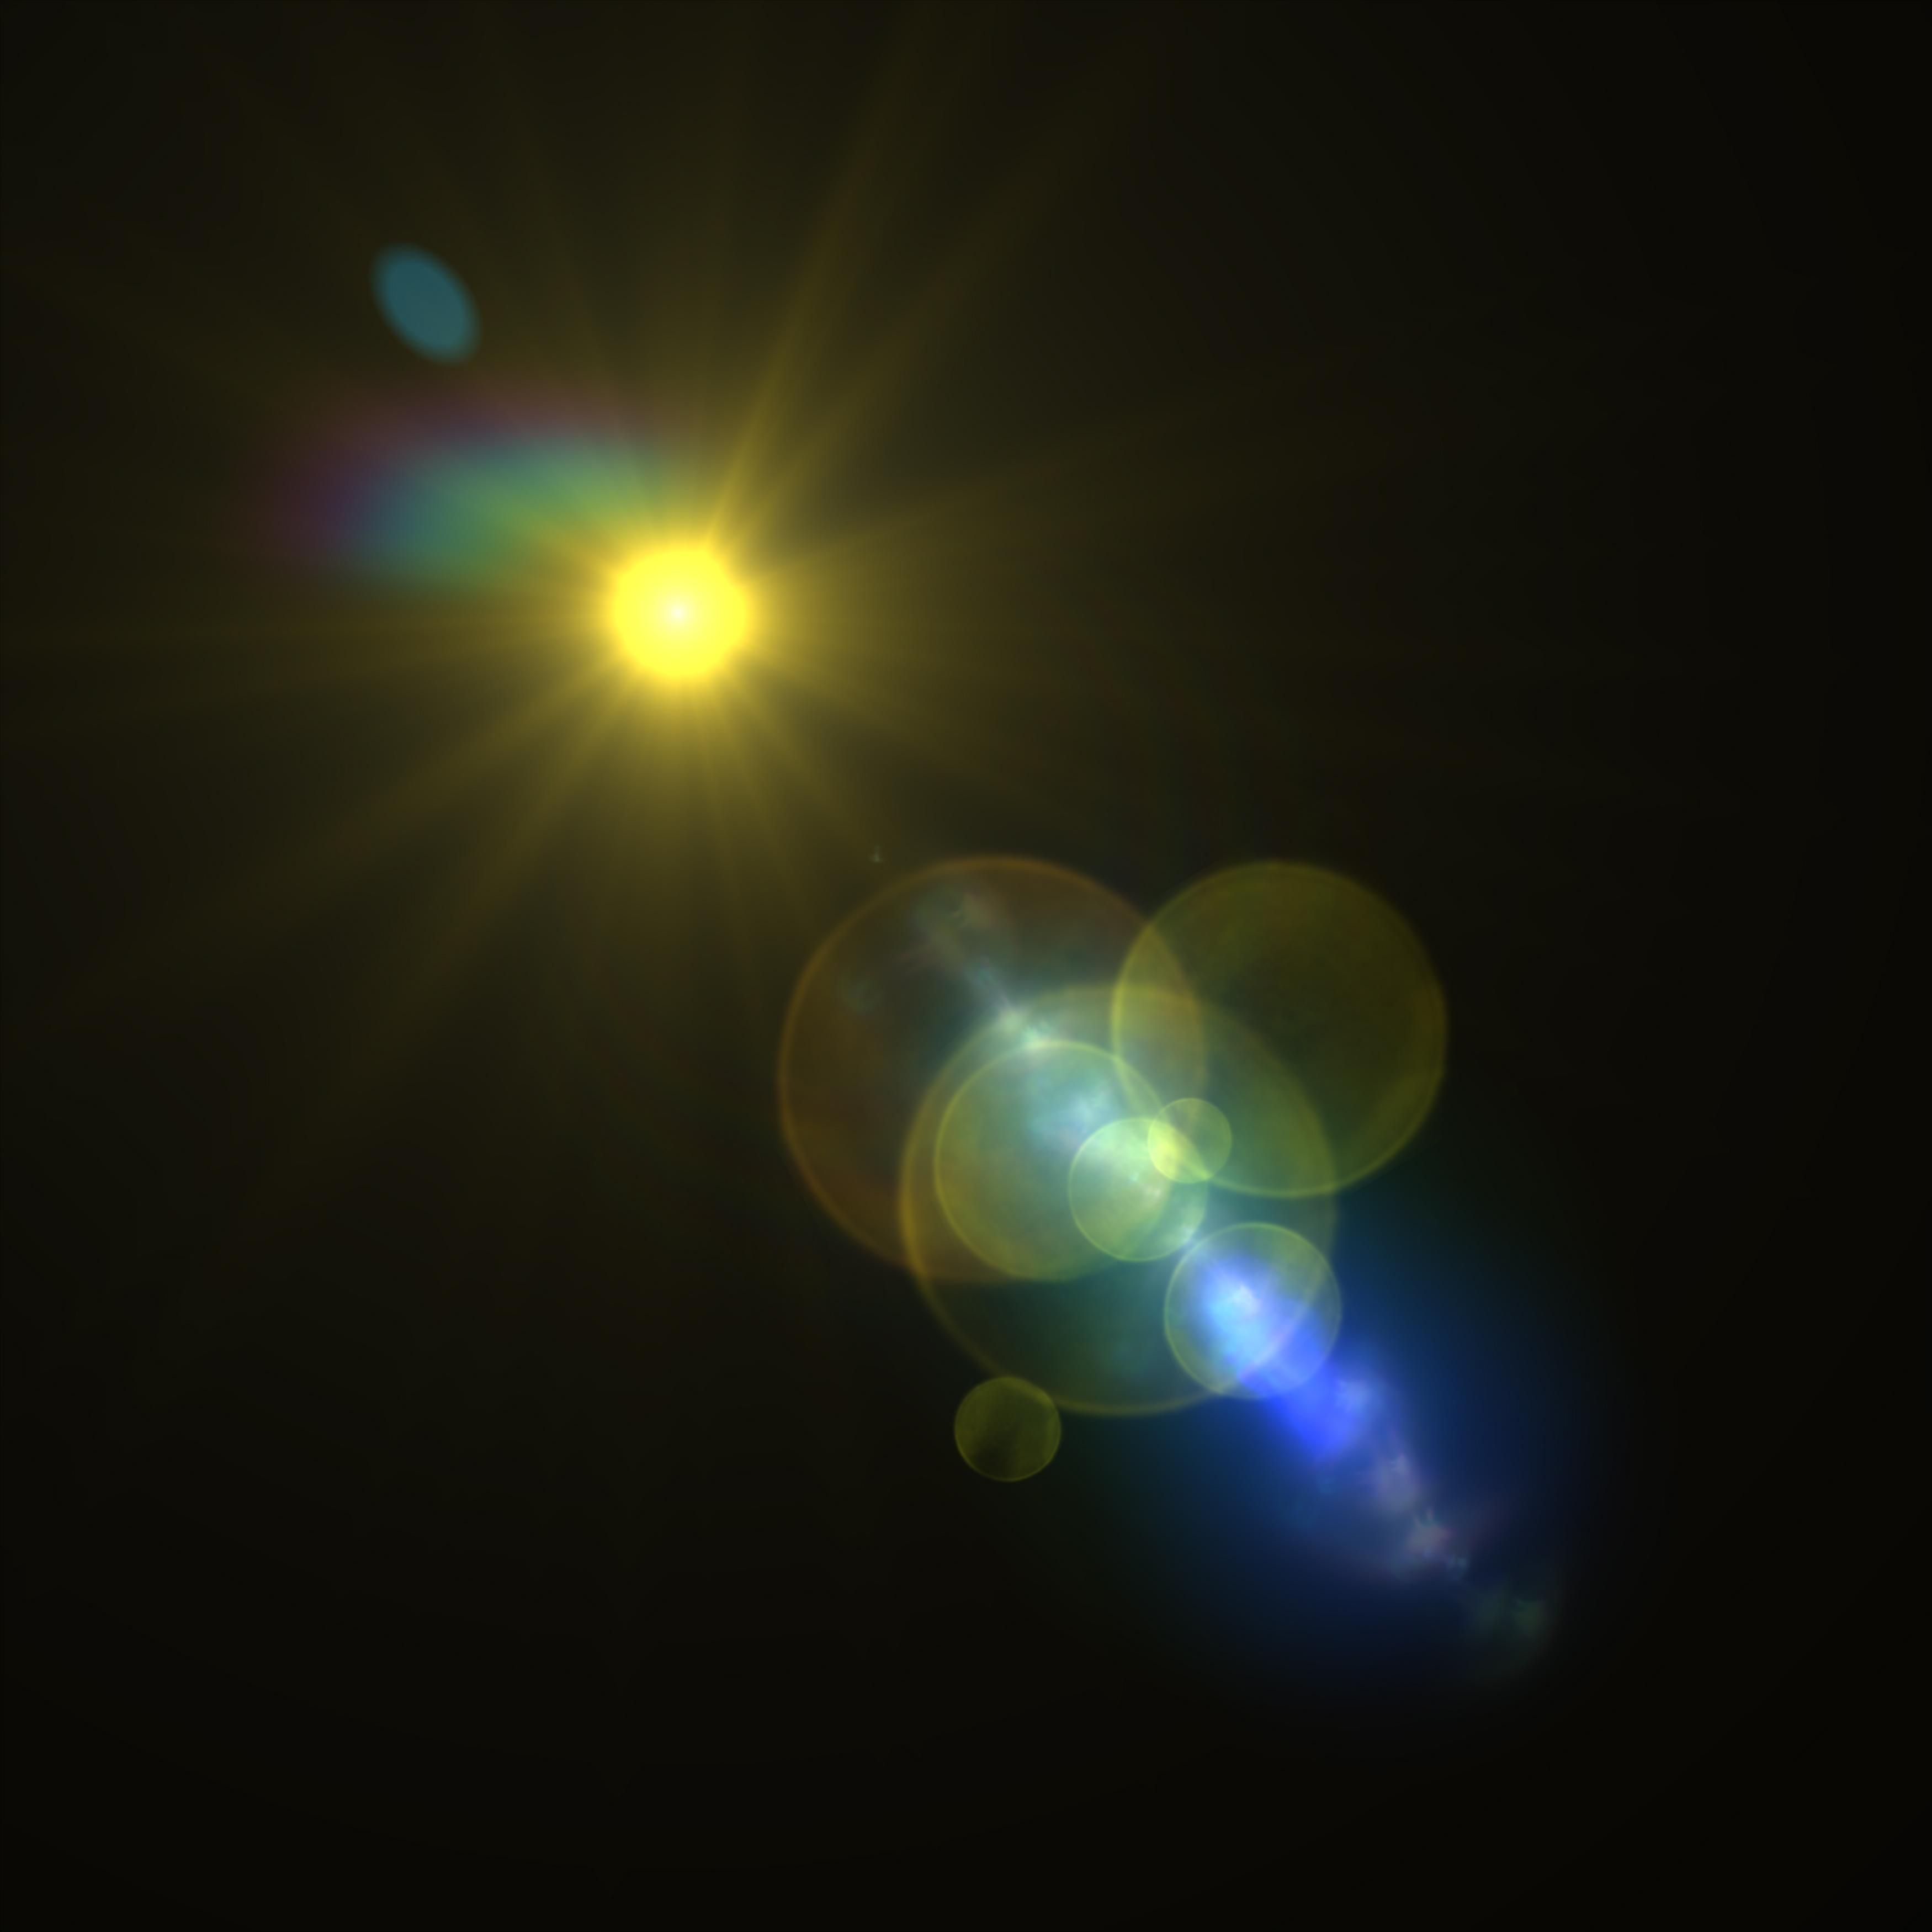 PhotoshopSunduchok - Как сделать эффект заката солнца 13